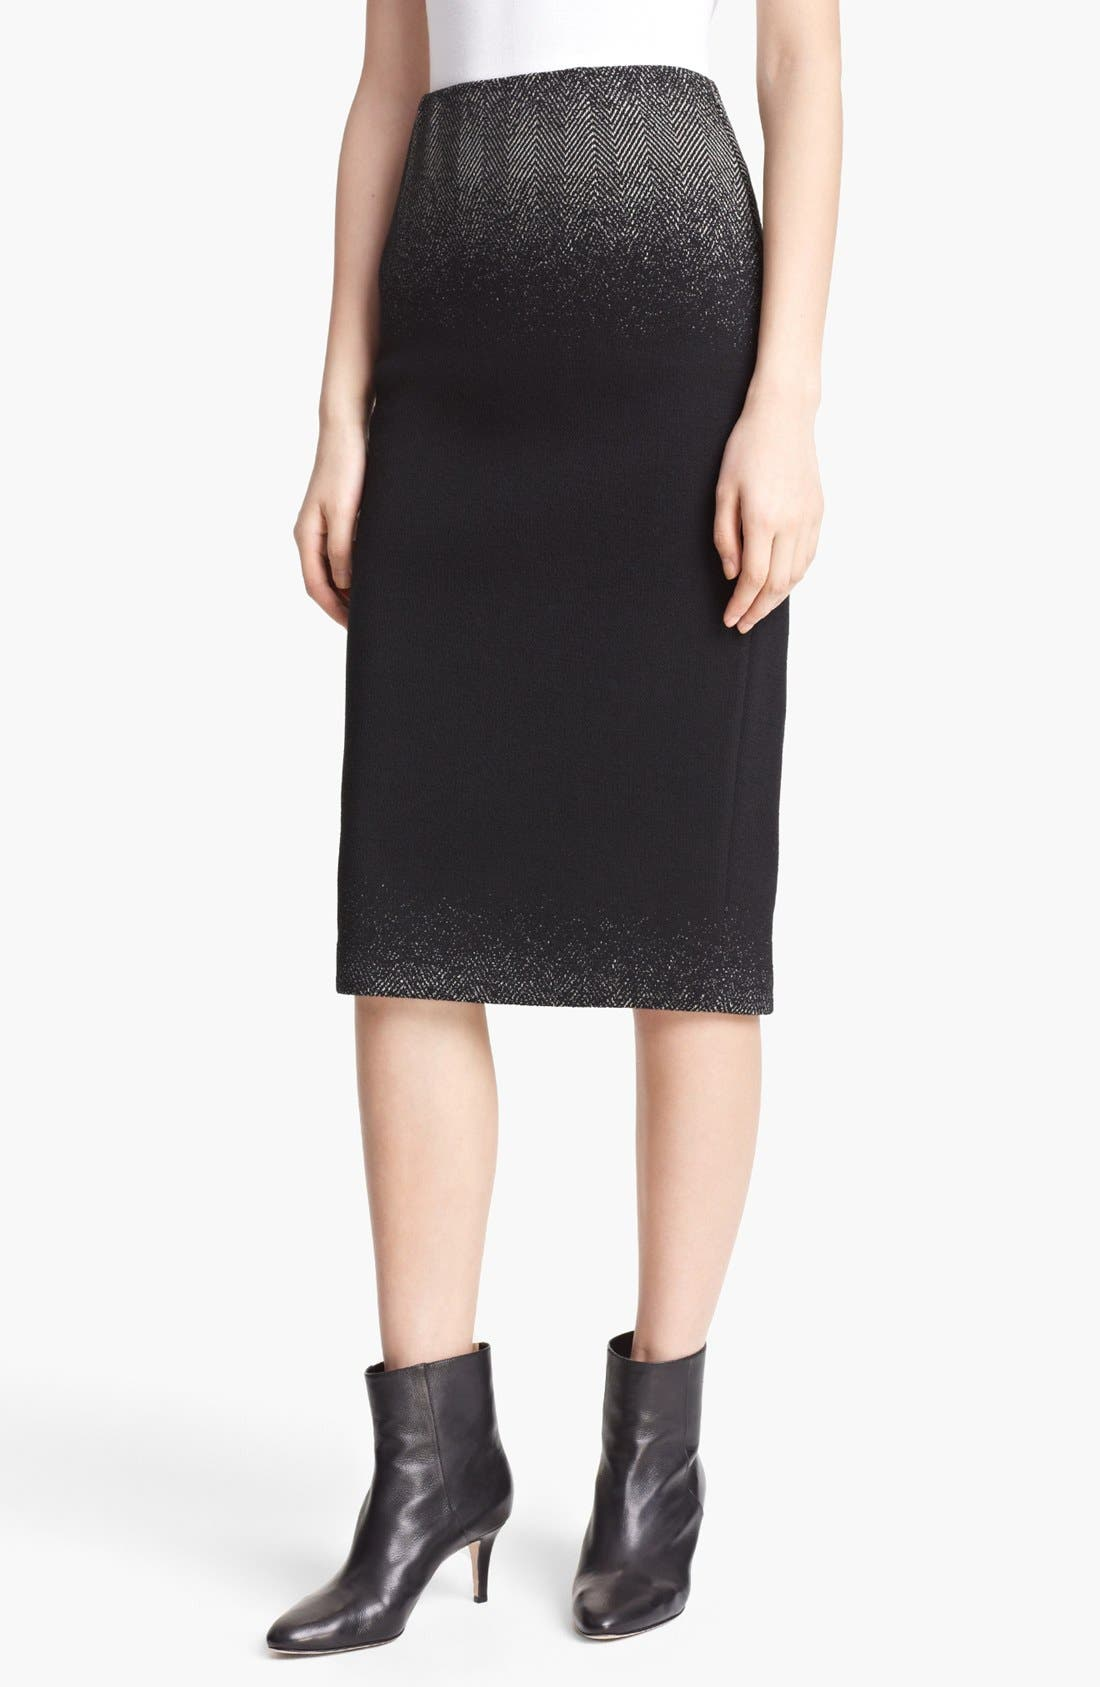 Alternate Image 1 Selected - Lida Baday Ombré Jacquard Pencil Skirt